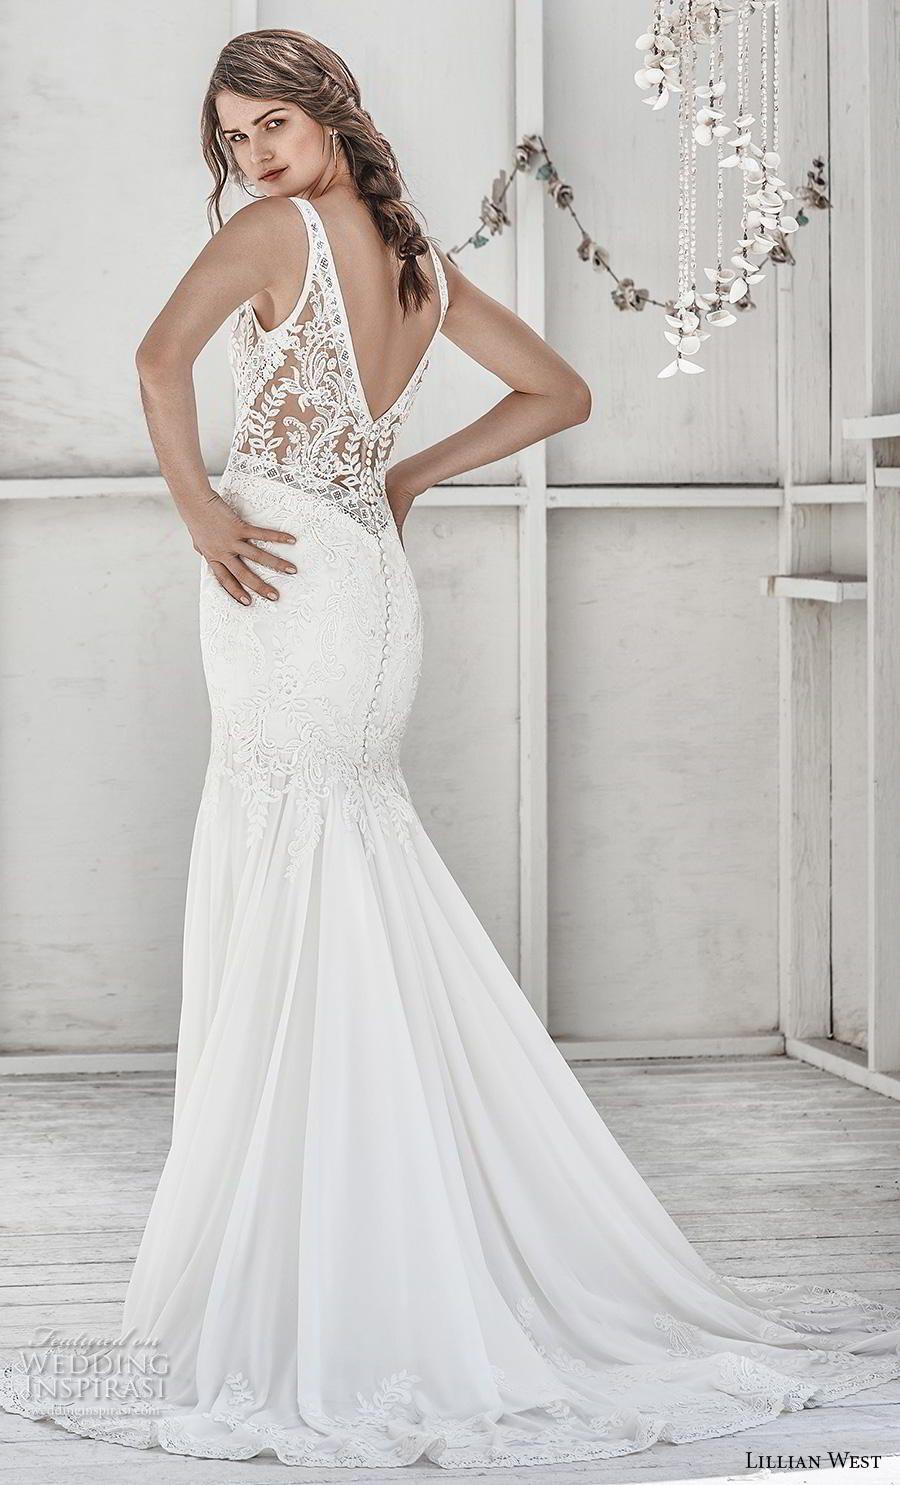 Lillian west wedding dress  Lillian West Spring  Wedding Dresses  F  Gowns  Pinterest